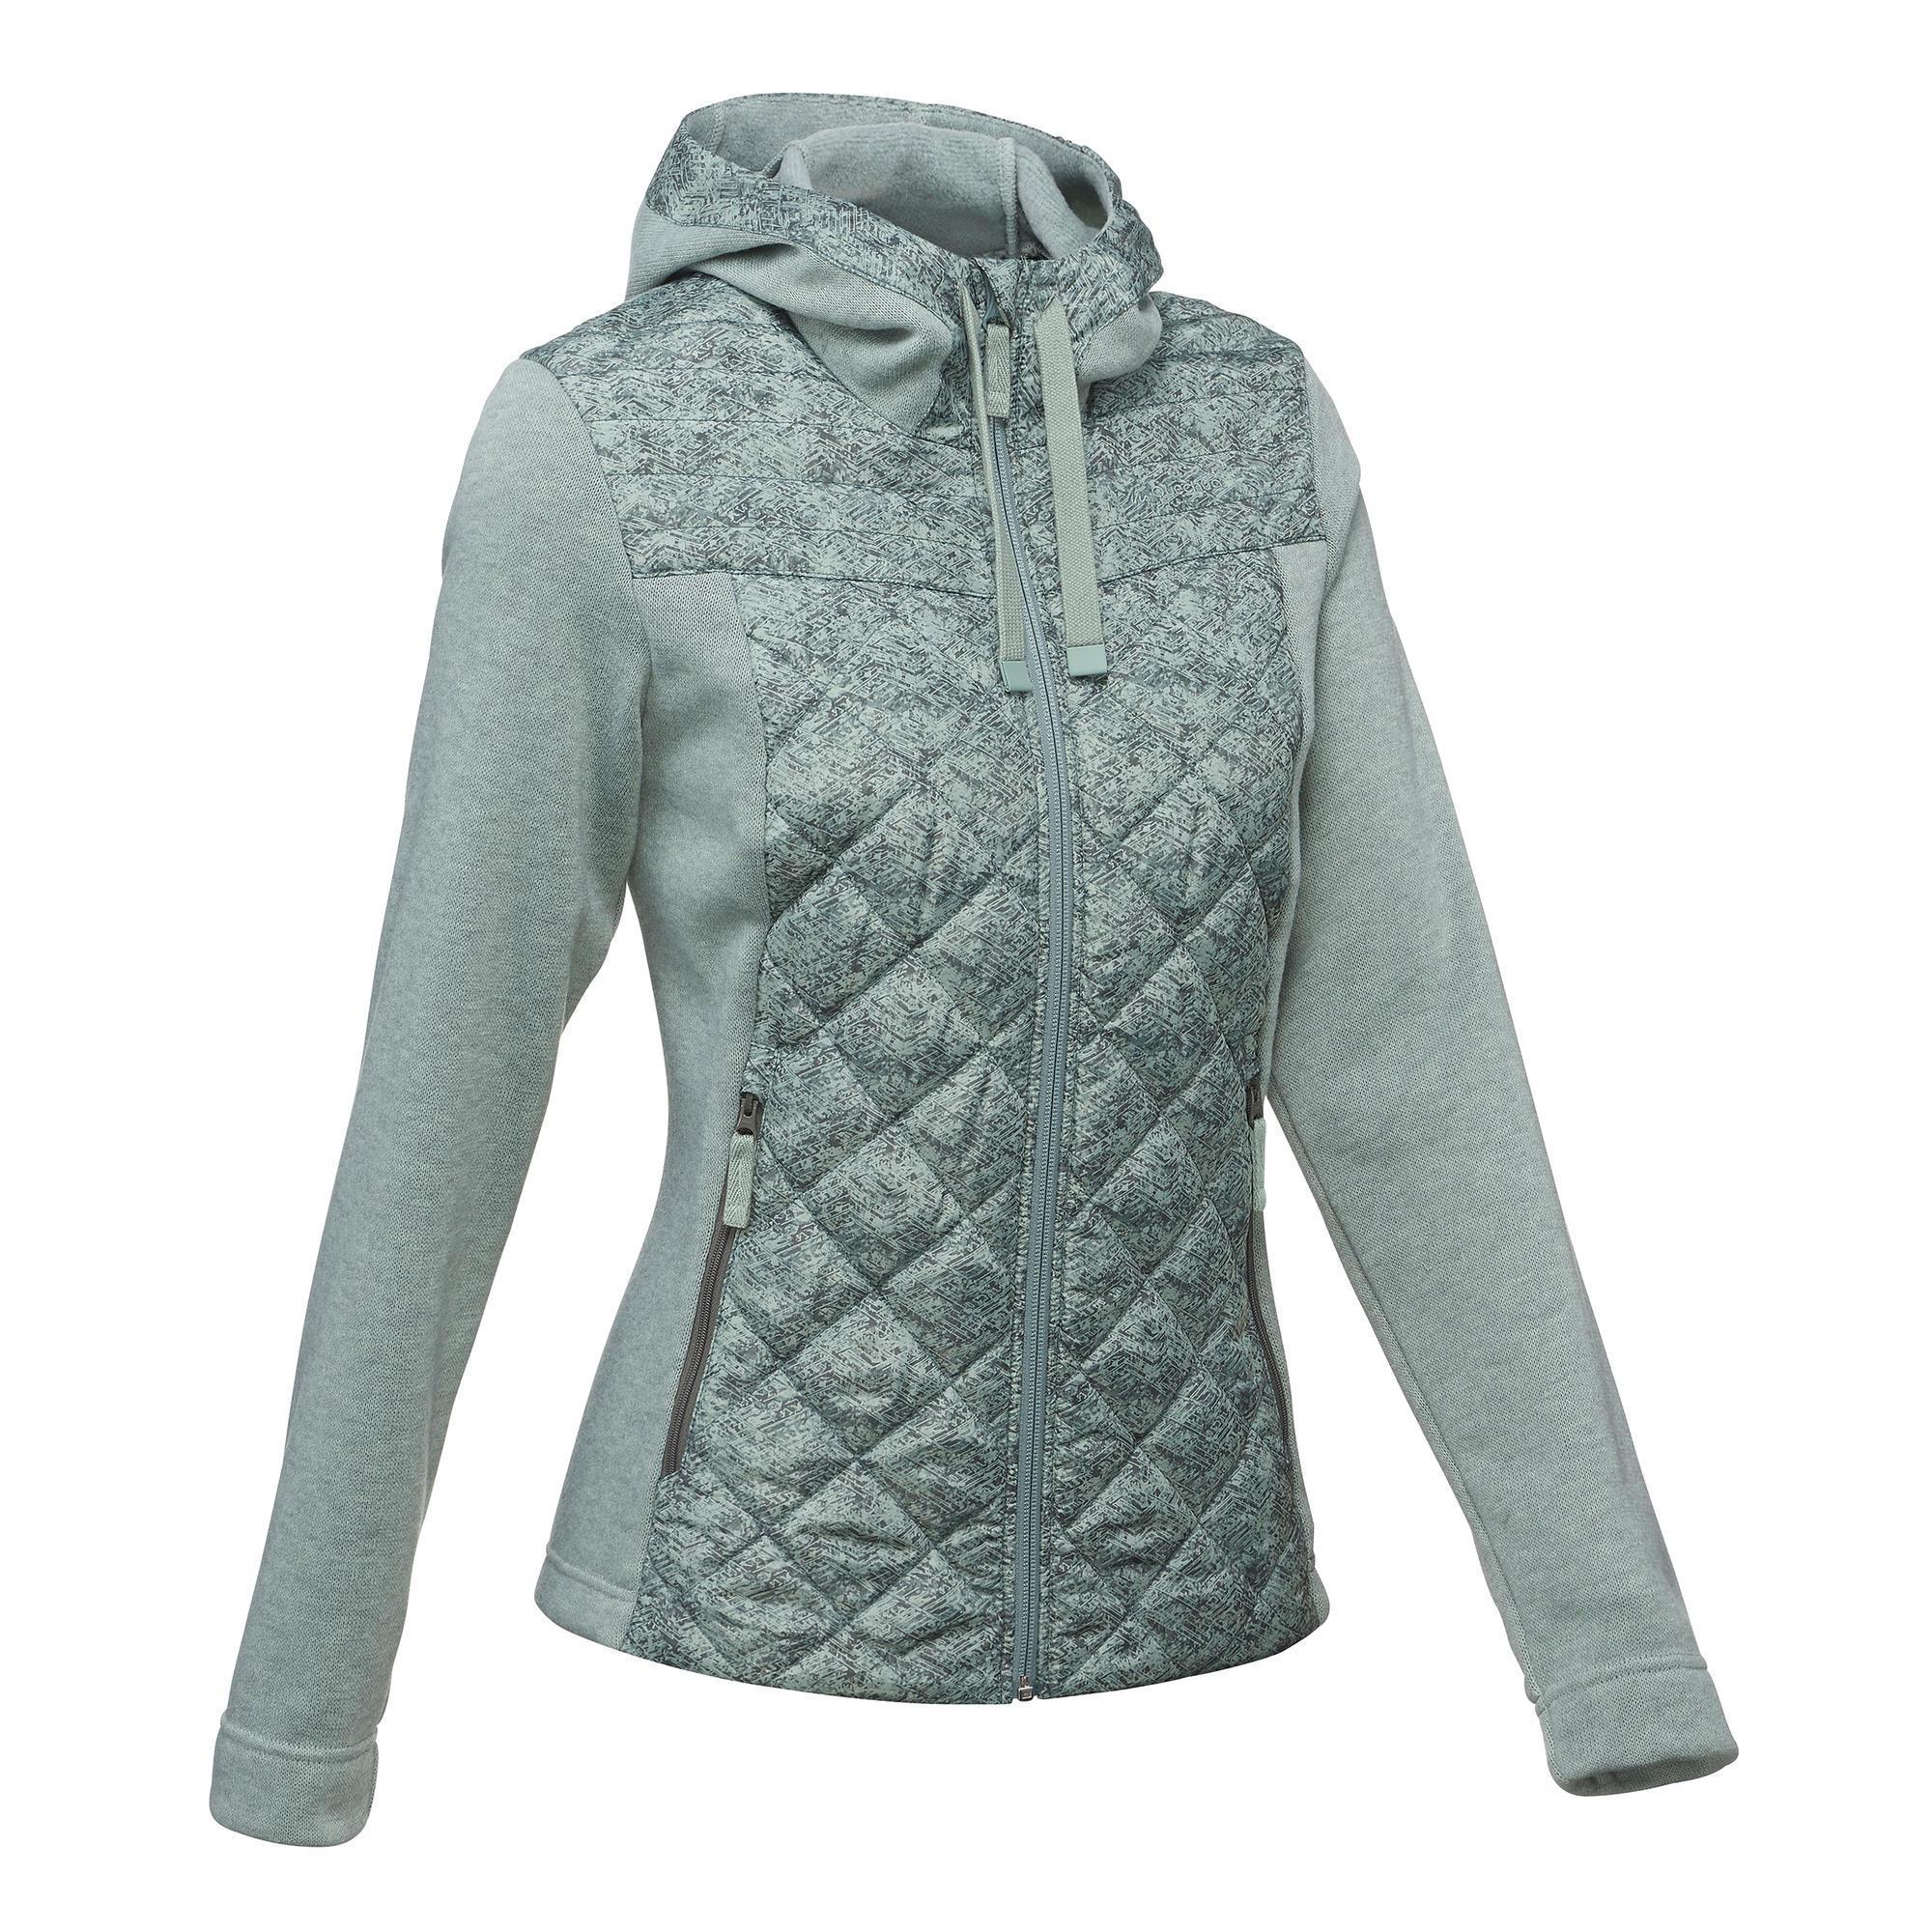 Fleecejacke Hybrid NH500 Damen kaki hell   Bekleidung > Jacken > Fleecejacken   Grün - Khaki   Polyester   Quechua